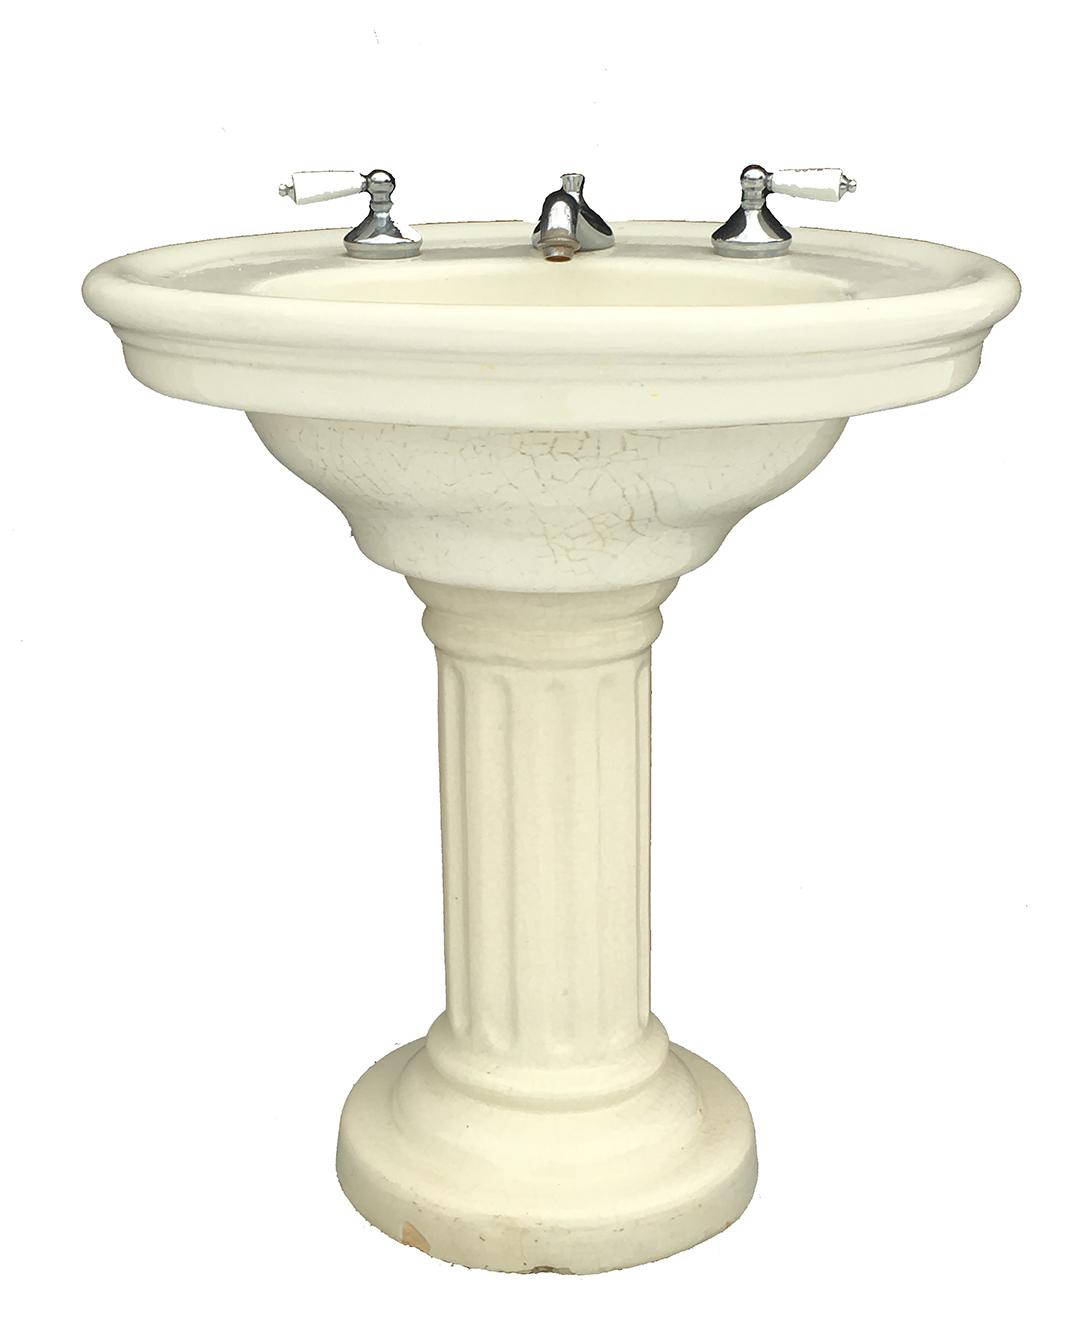 antique trenton pottery ideal earthenware pedestal sink with fluted pedestal circa 1916